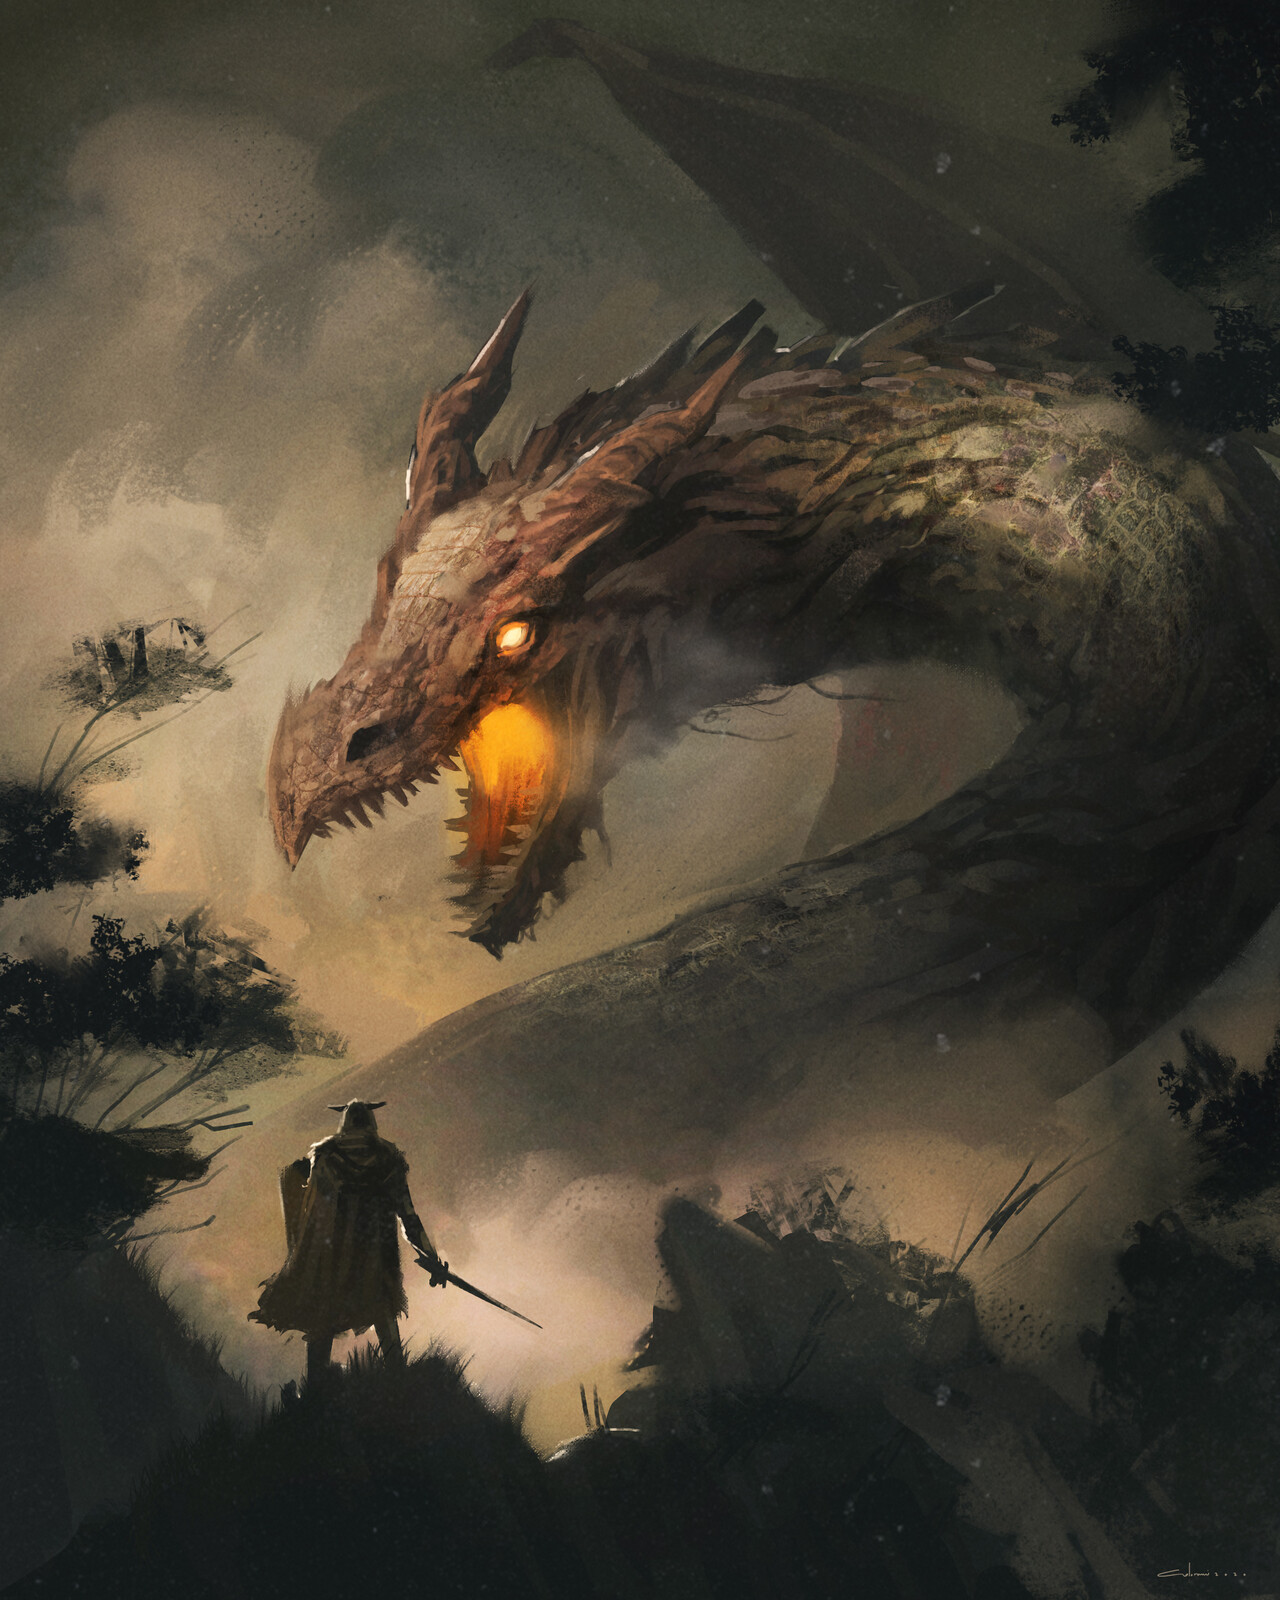 Beowulf - Slaying the Dragon